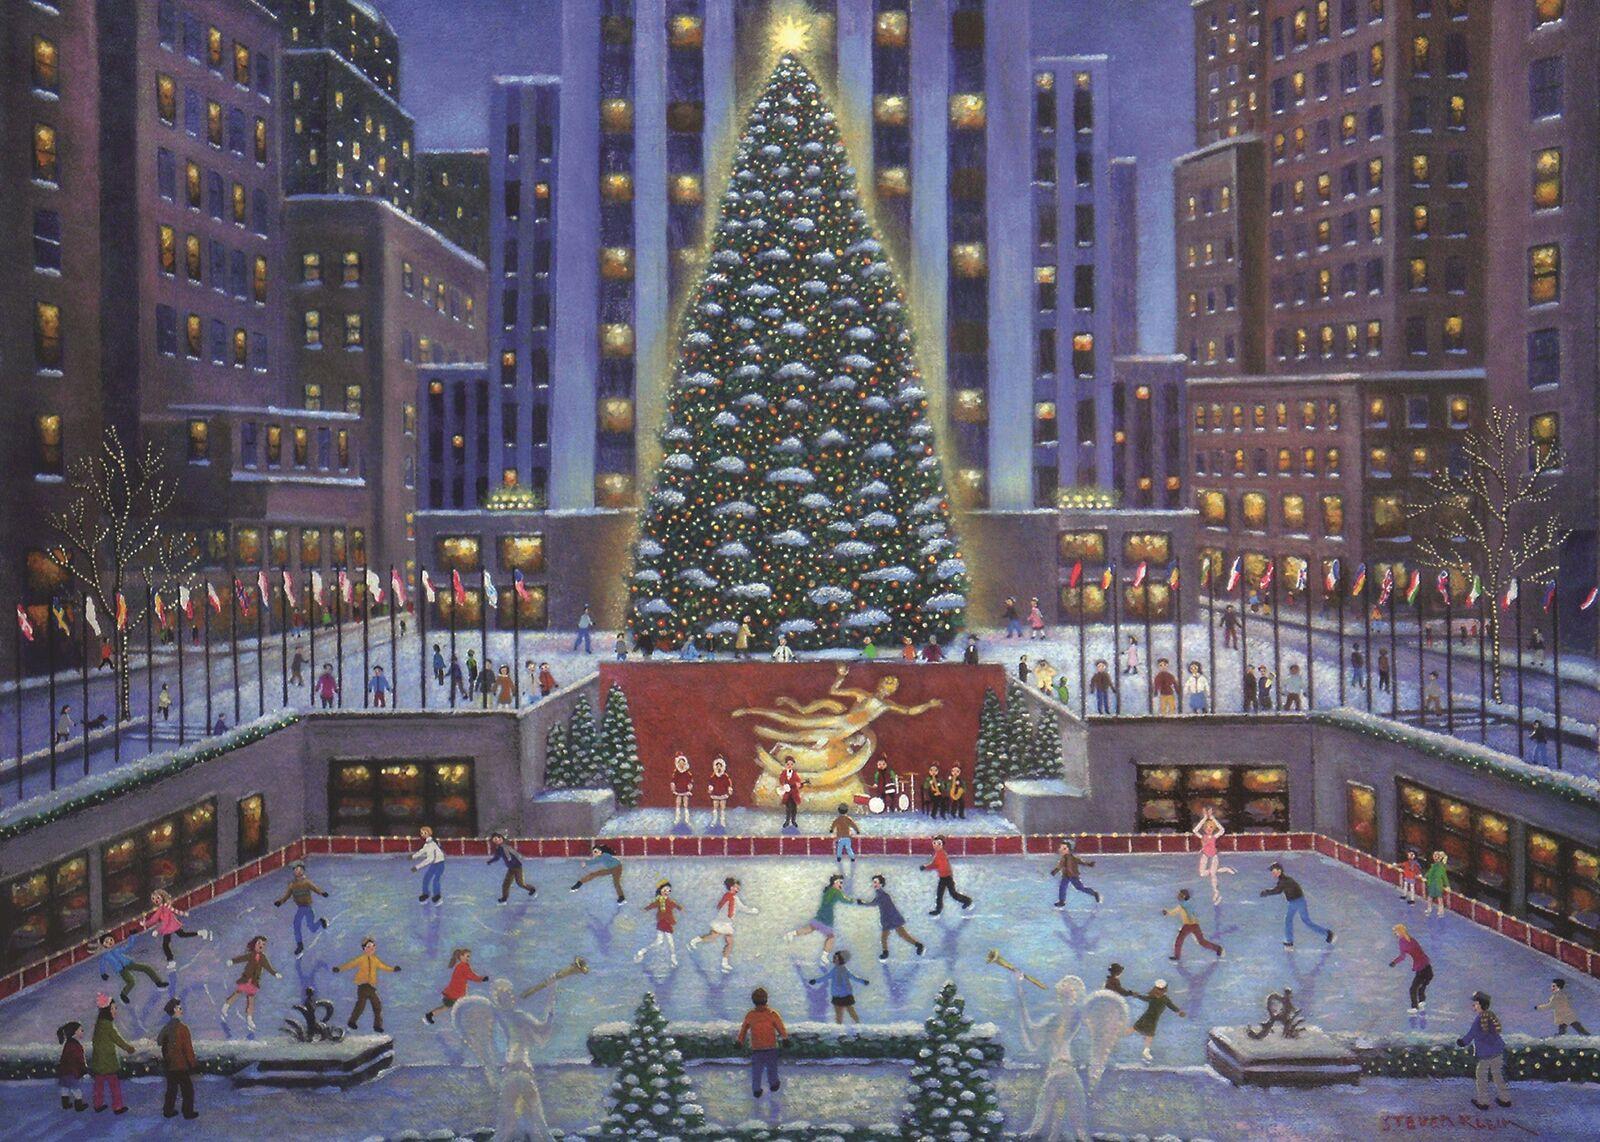 NYC Christmas Landmarks / Monuments Jigsaw Puzzle